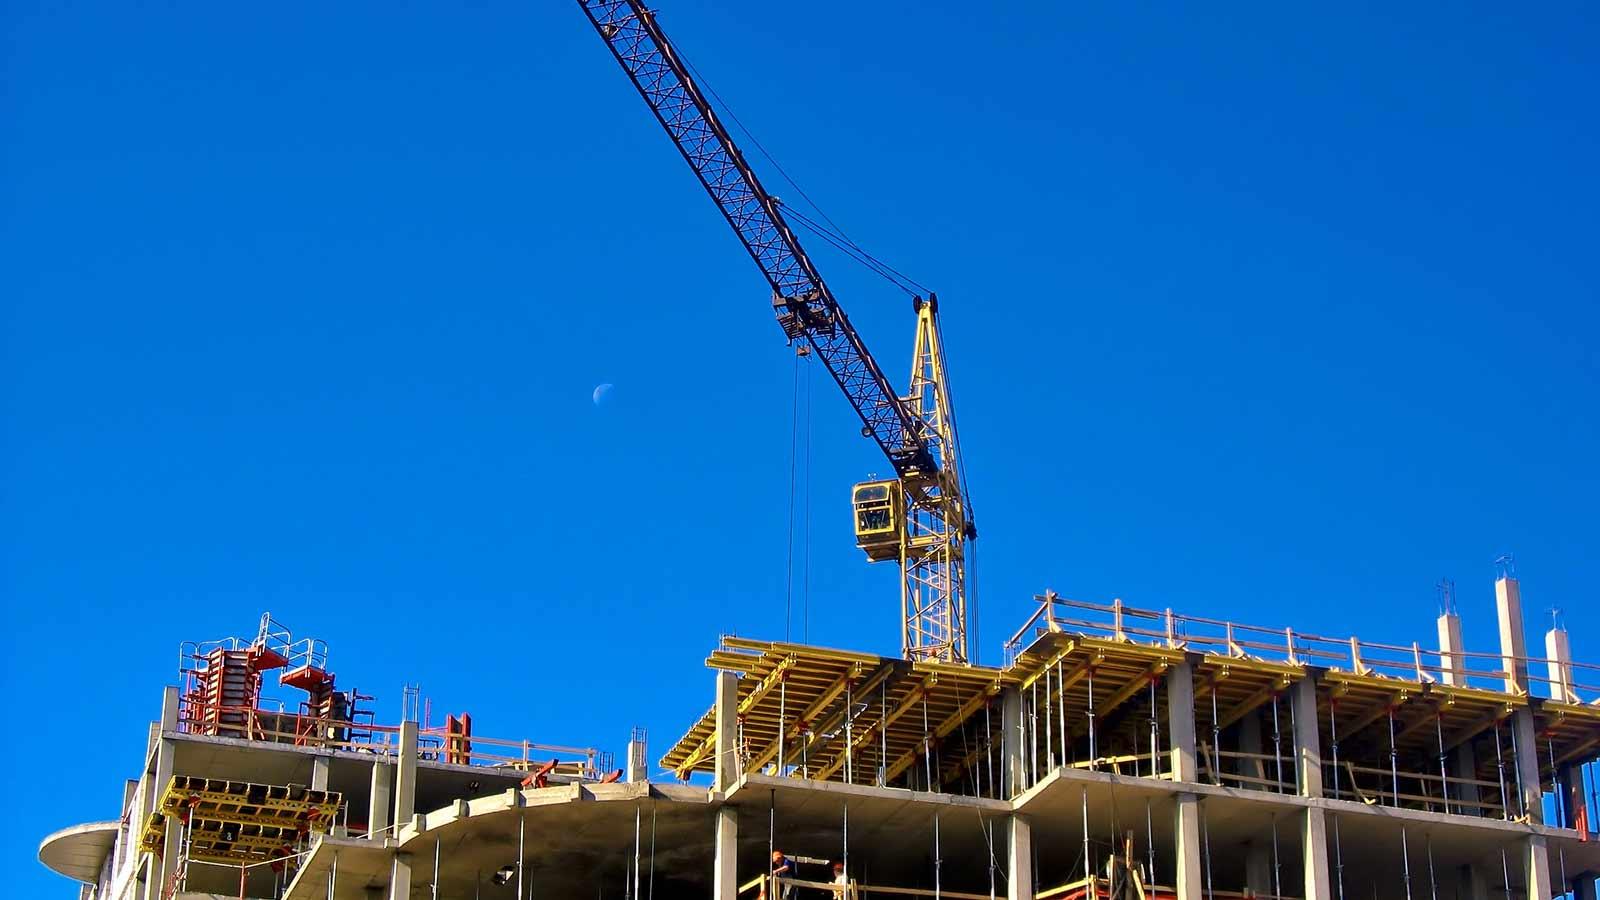 vastgoed-ontwikkeling-real-estate-vastgoedmanagement-risico-analyse-consult-consultant-consultants-advies-adviseur-adivseurs-friesland